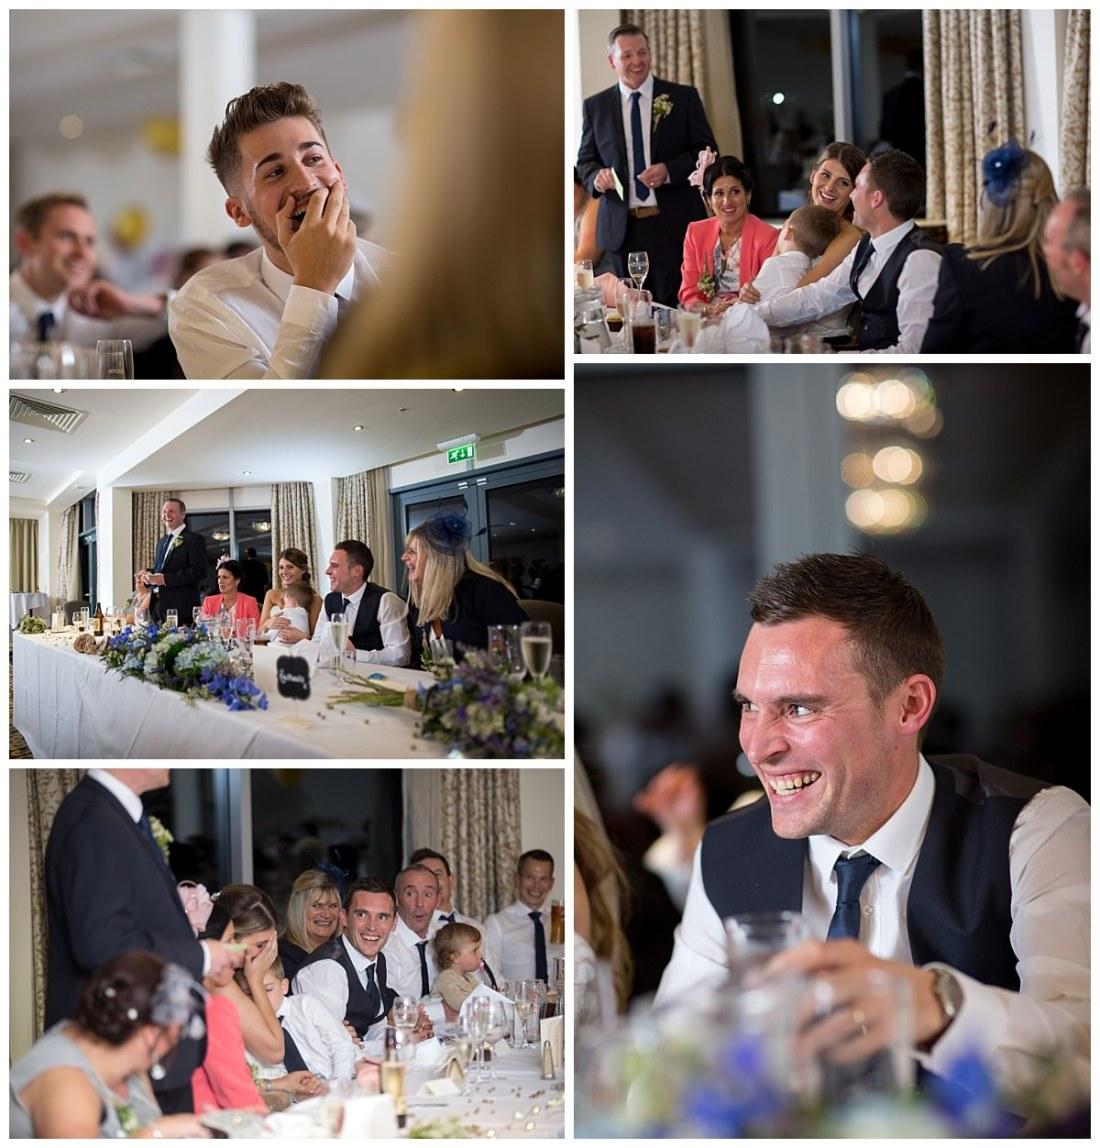 Wedding Speeches at the Raithwaite Estate